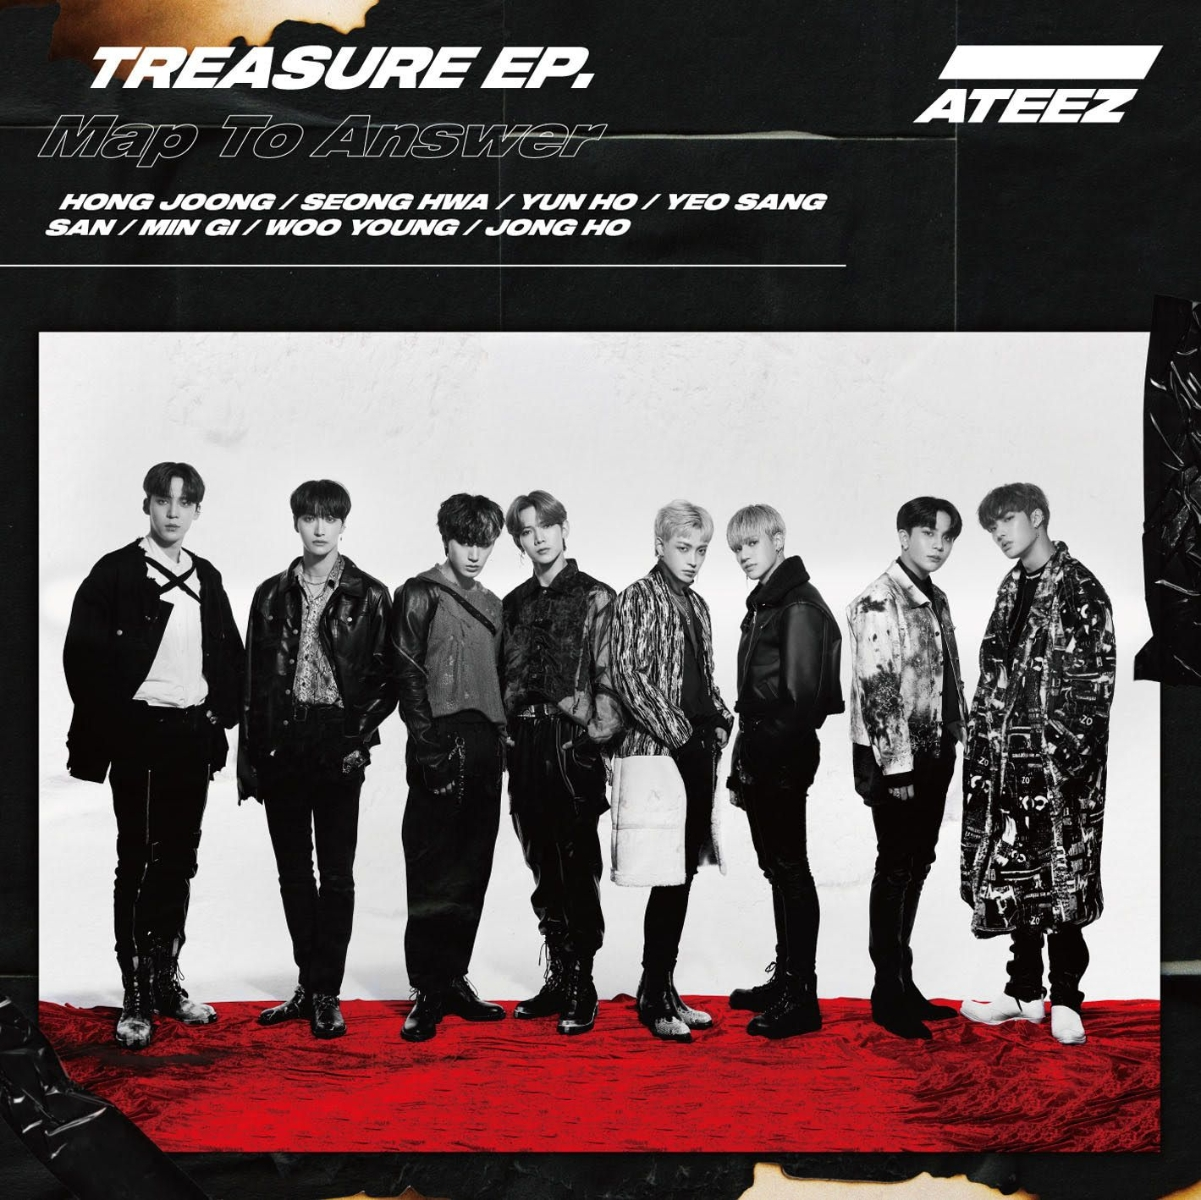 『ATEEZ - Answer (Japanese Ver.)』収録の『TREASURE EP. Map To Answer』ジャケット